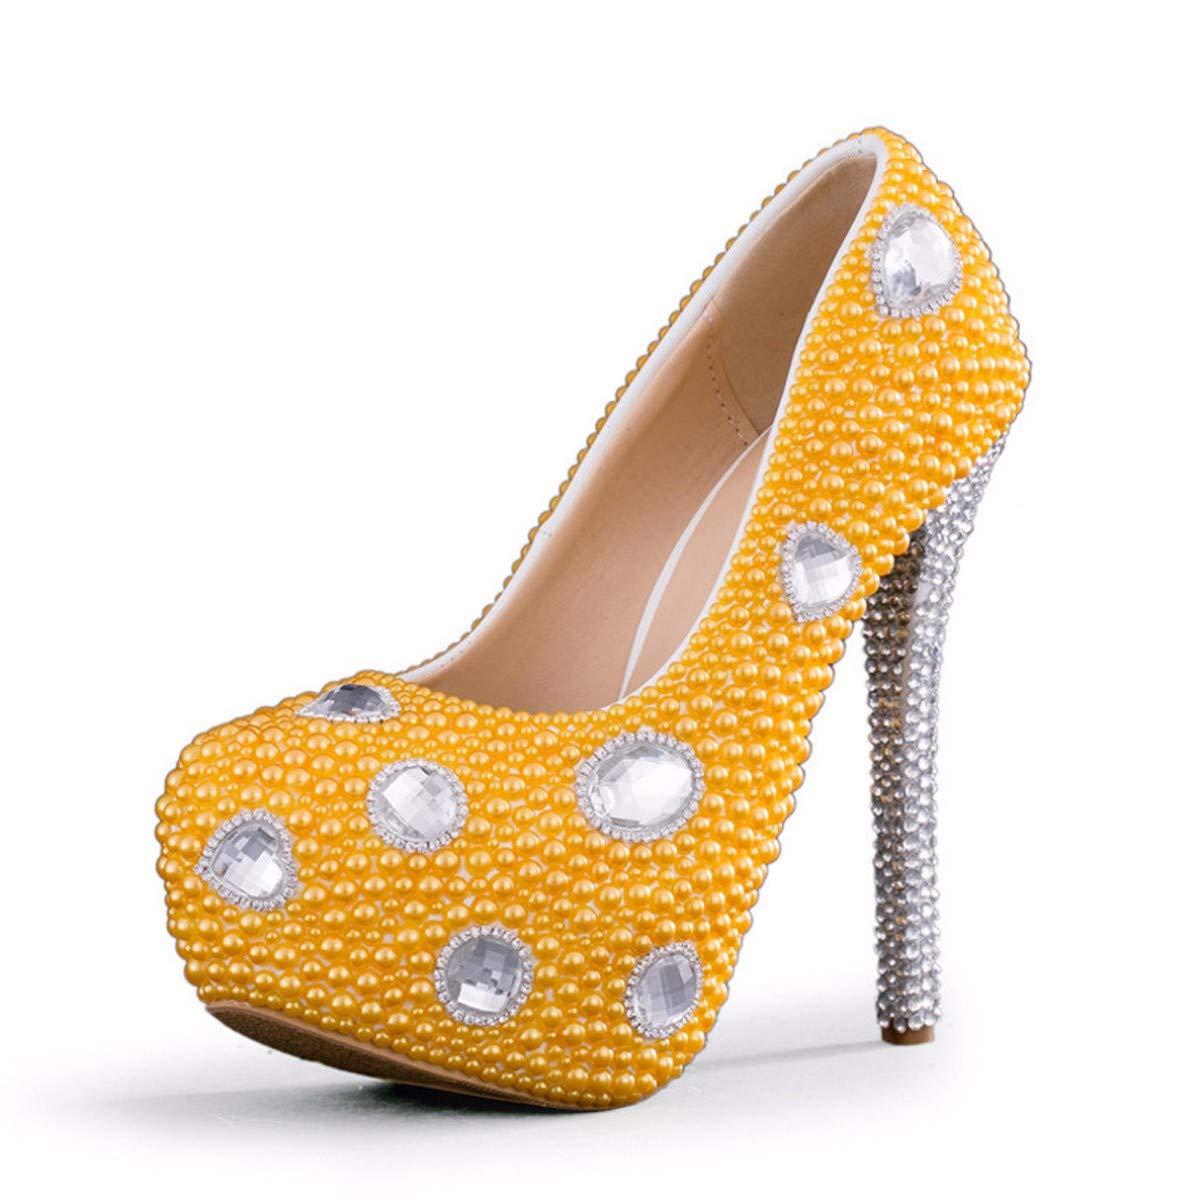 KPHY Damenschuhe/Diamond 14 High Heels Qualität Gelb Bankett Die Schuhe.